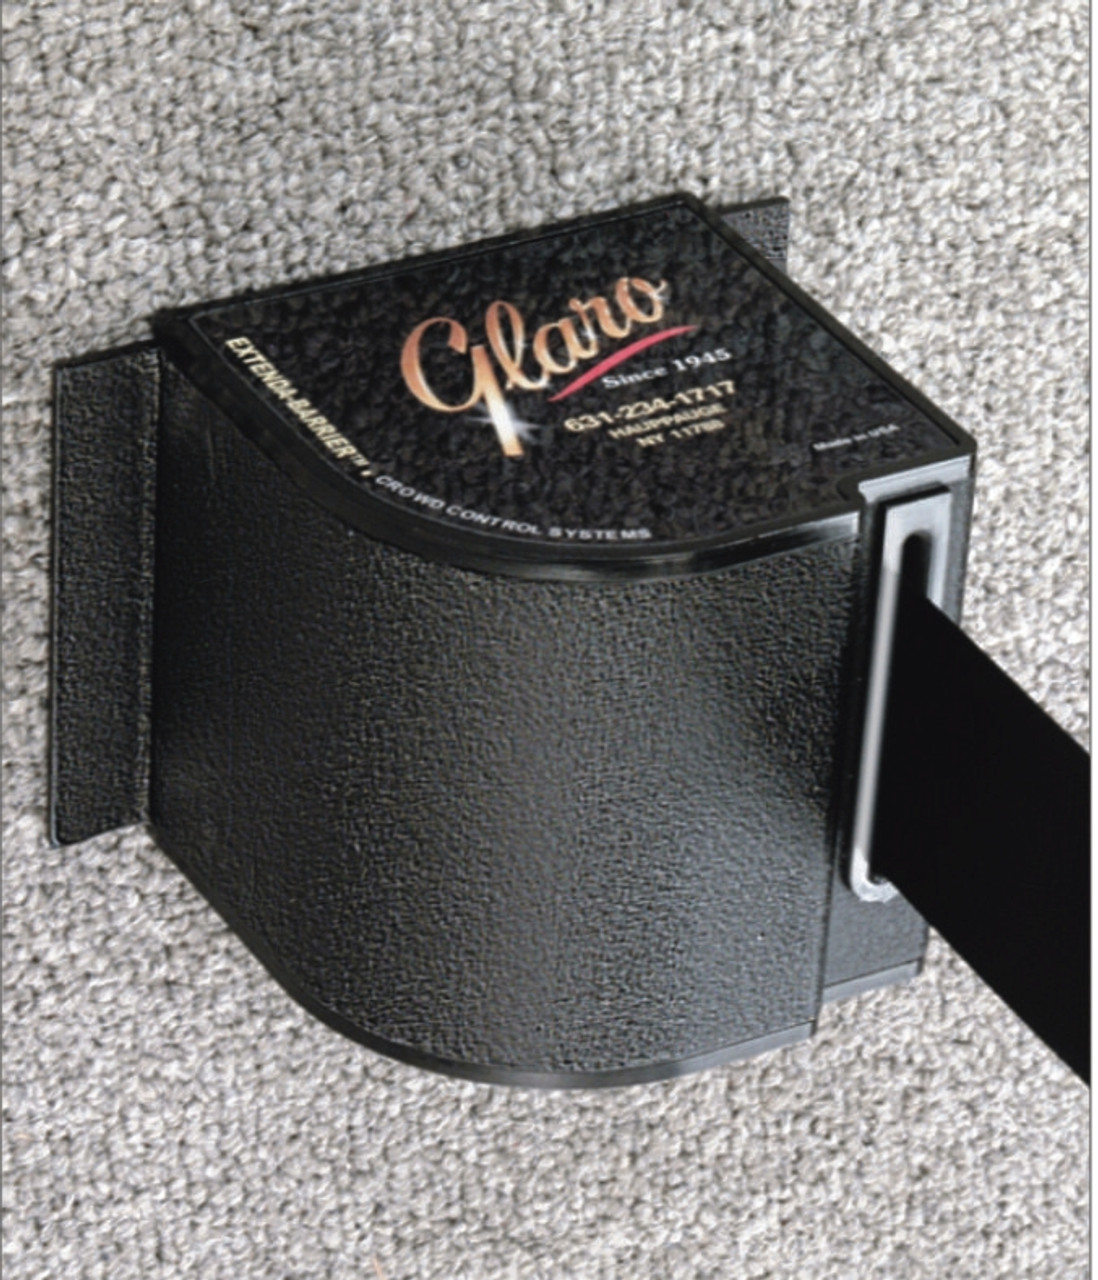 W18 Extenda-Barrier Aluminum or Black Retractable Crowd Control (18 Feet)